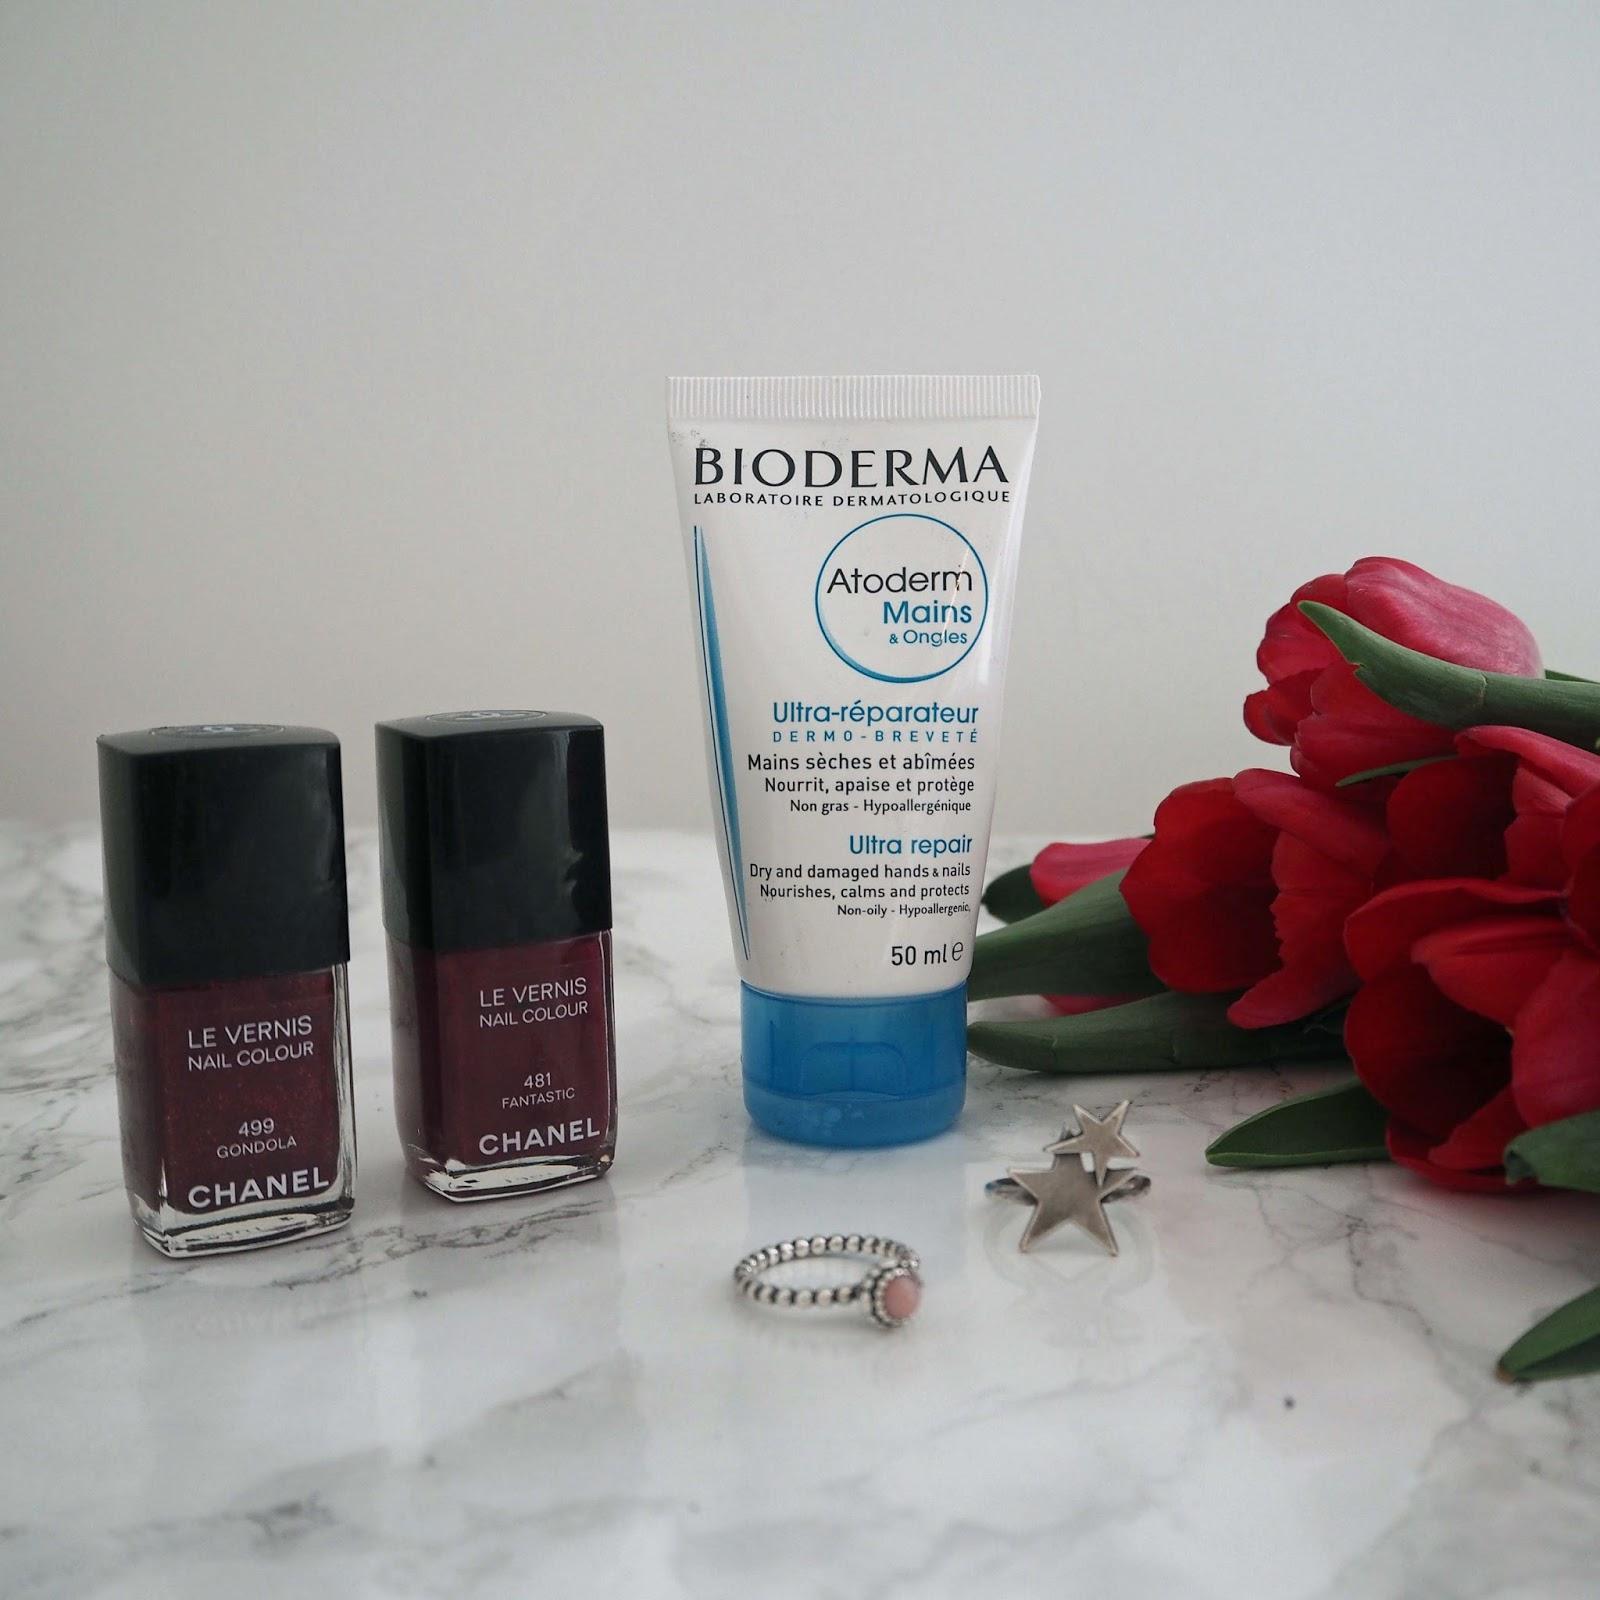 Bioderma hand cream review, over 40 blog